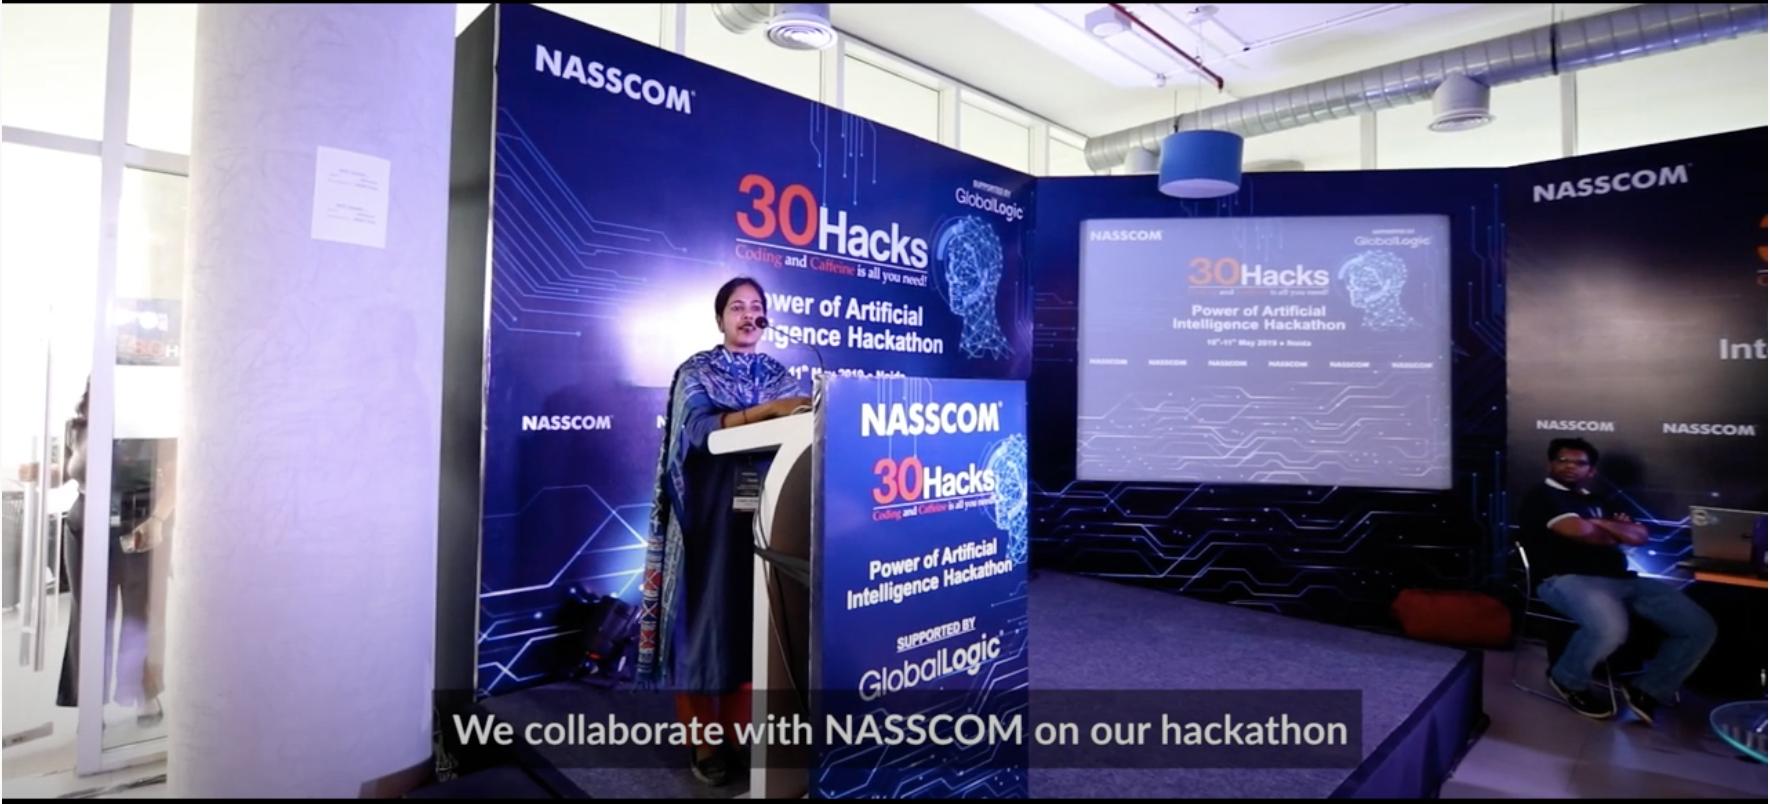 30 hacks insurity points 25